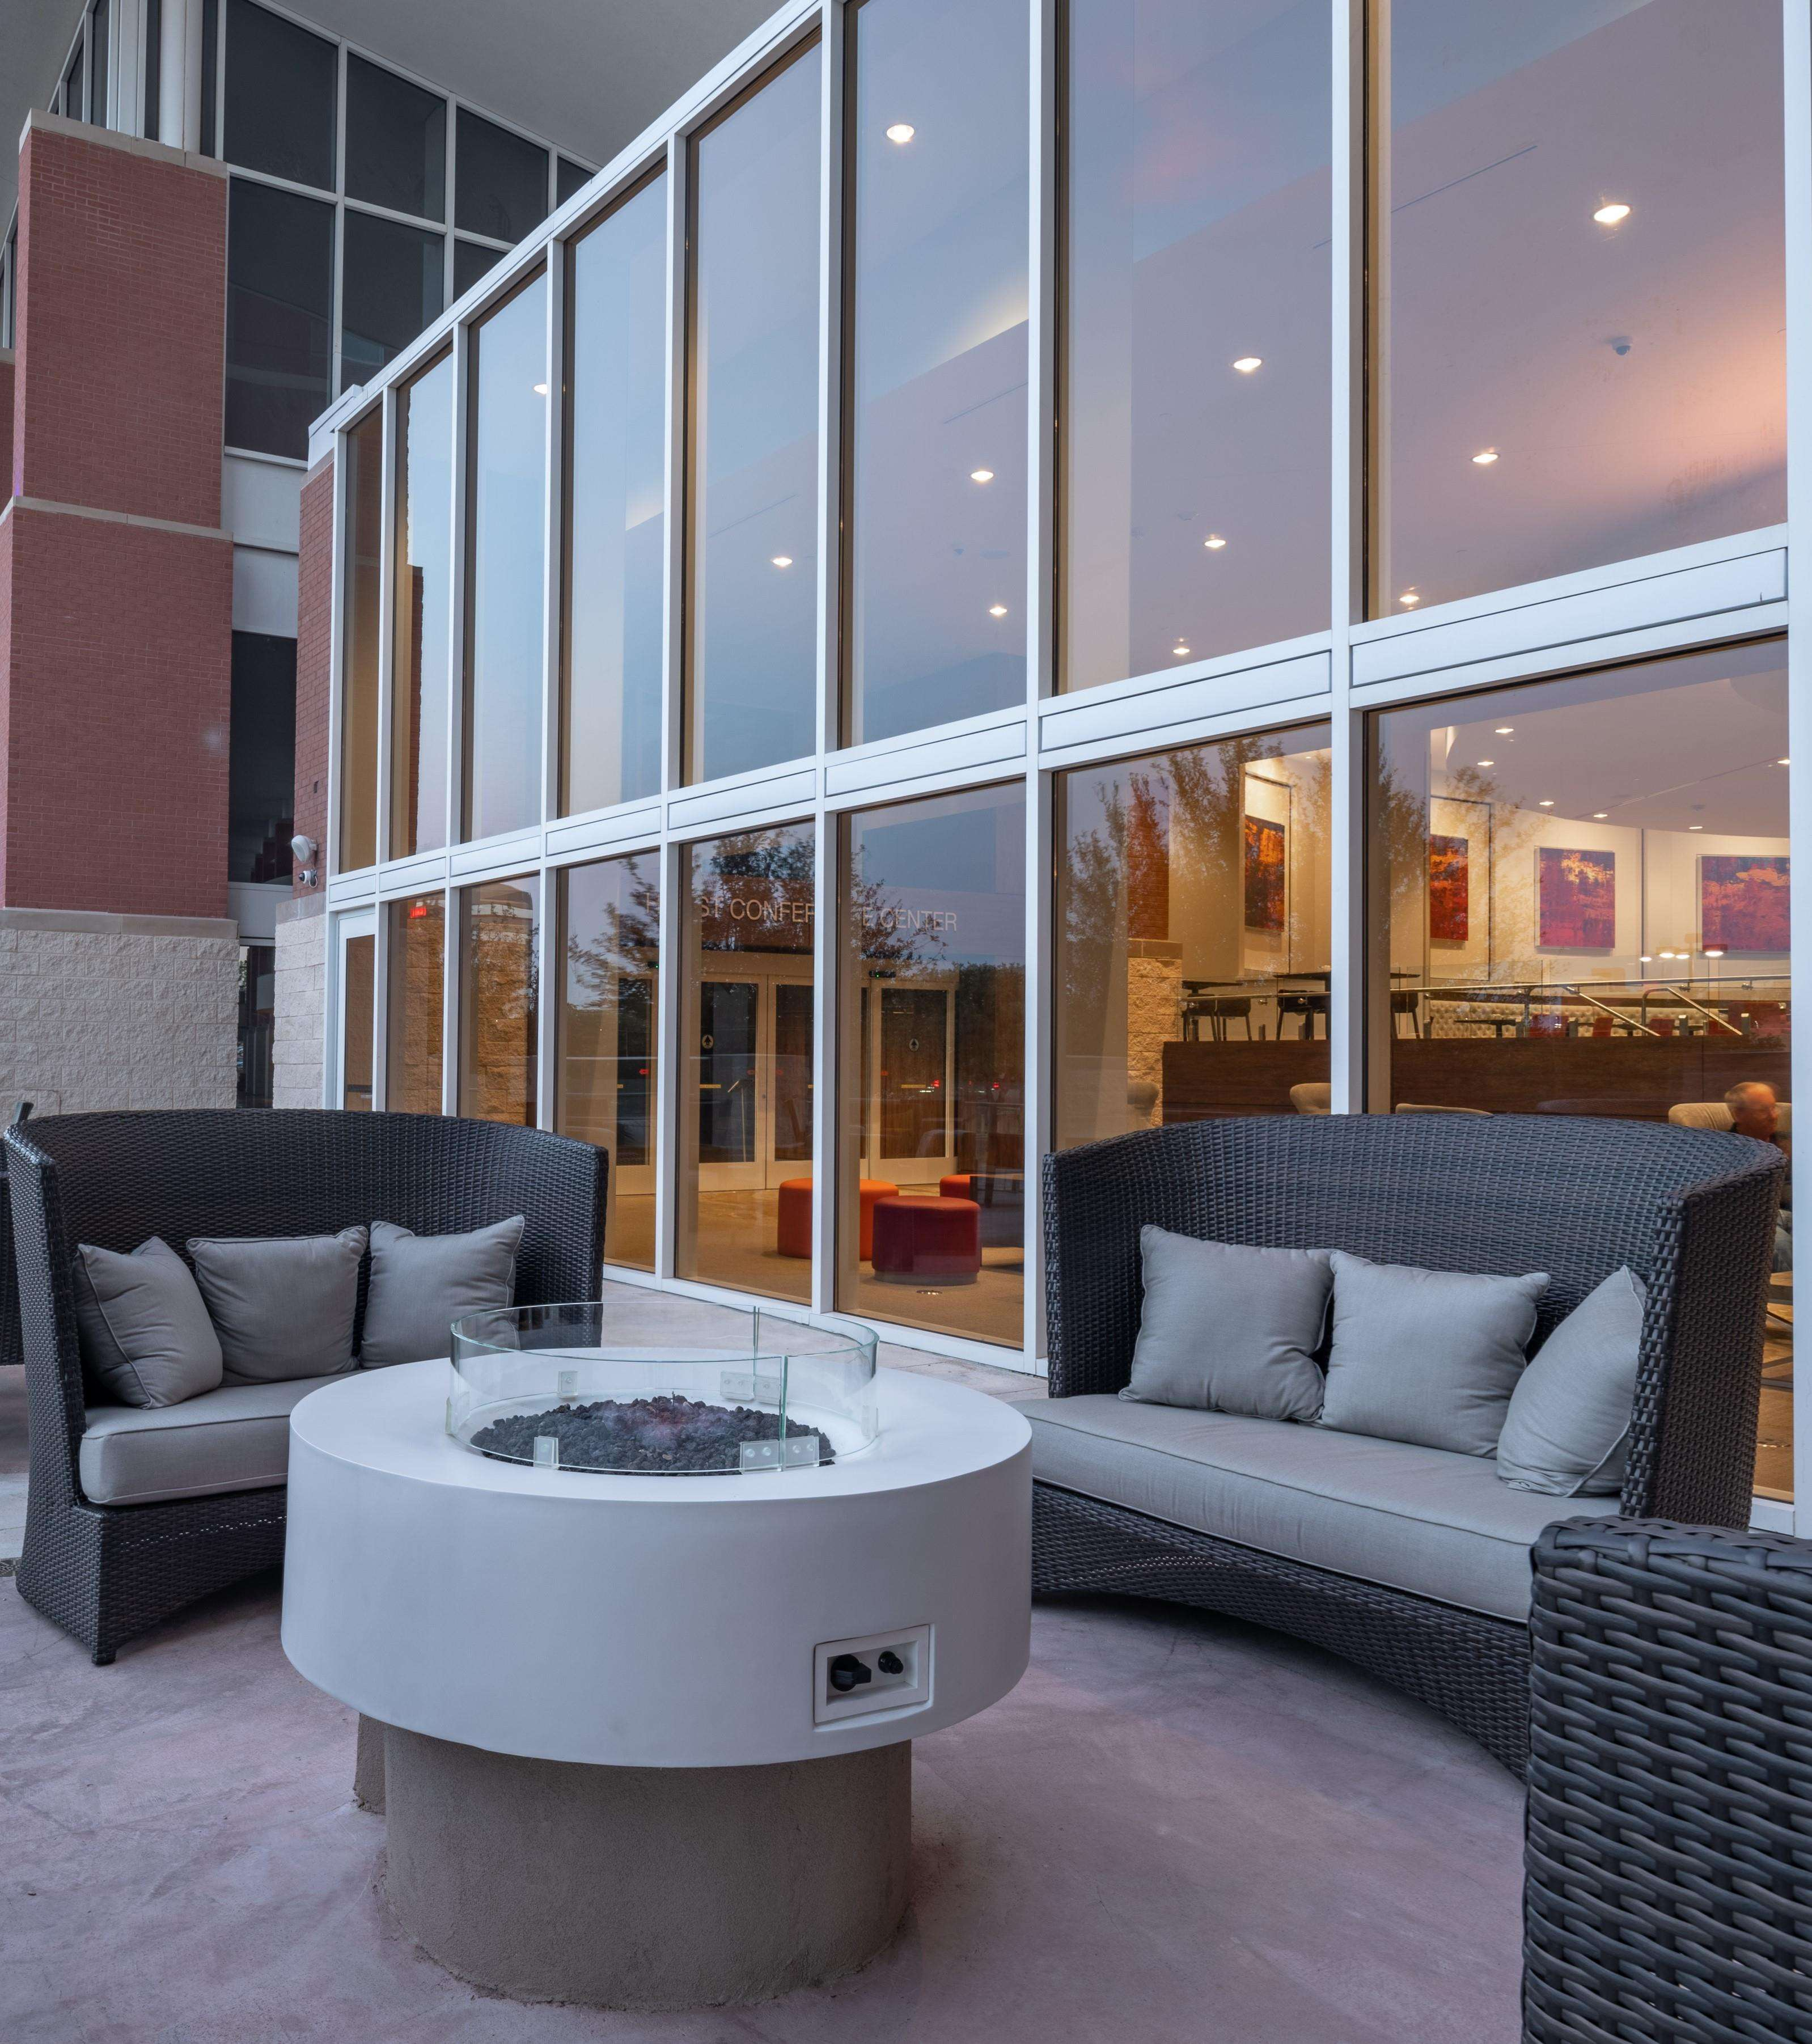 Hilton Garden Inn Dallas at Hurst Conference Center image 0